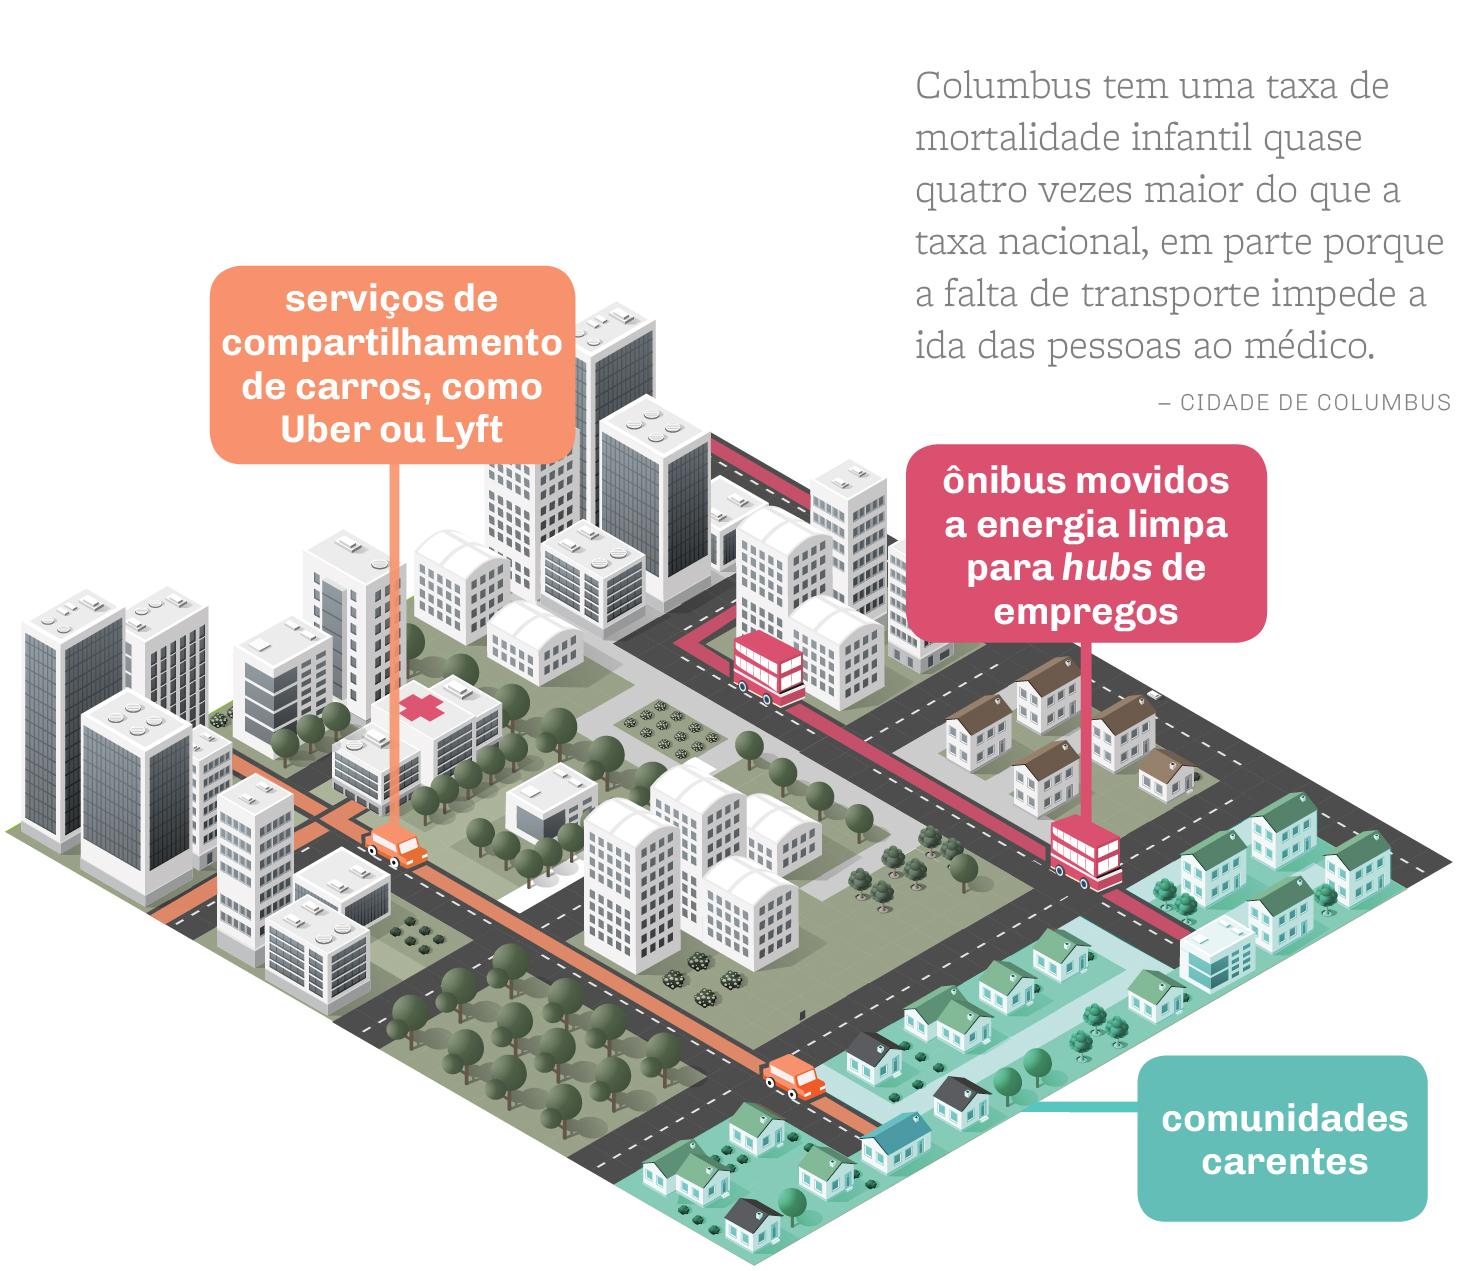 Gráfico mostra sistemas de transporte propostos pela cidade de Columbus (Shutterstock /Depto. de Estado/J. Maruszewski)